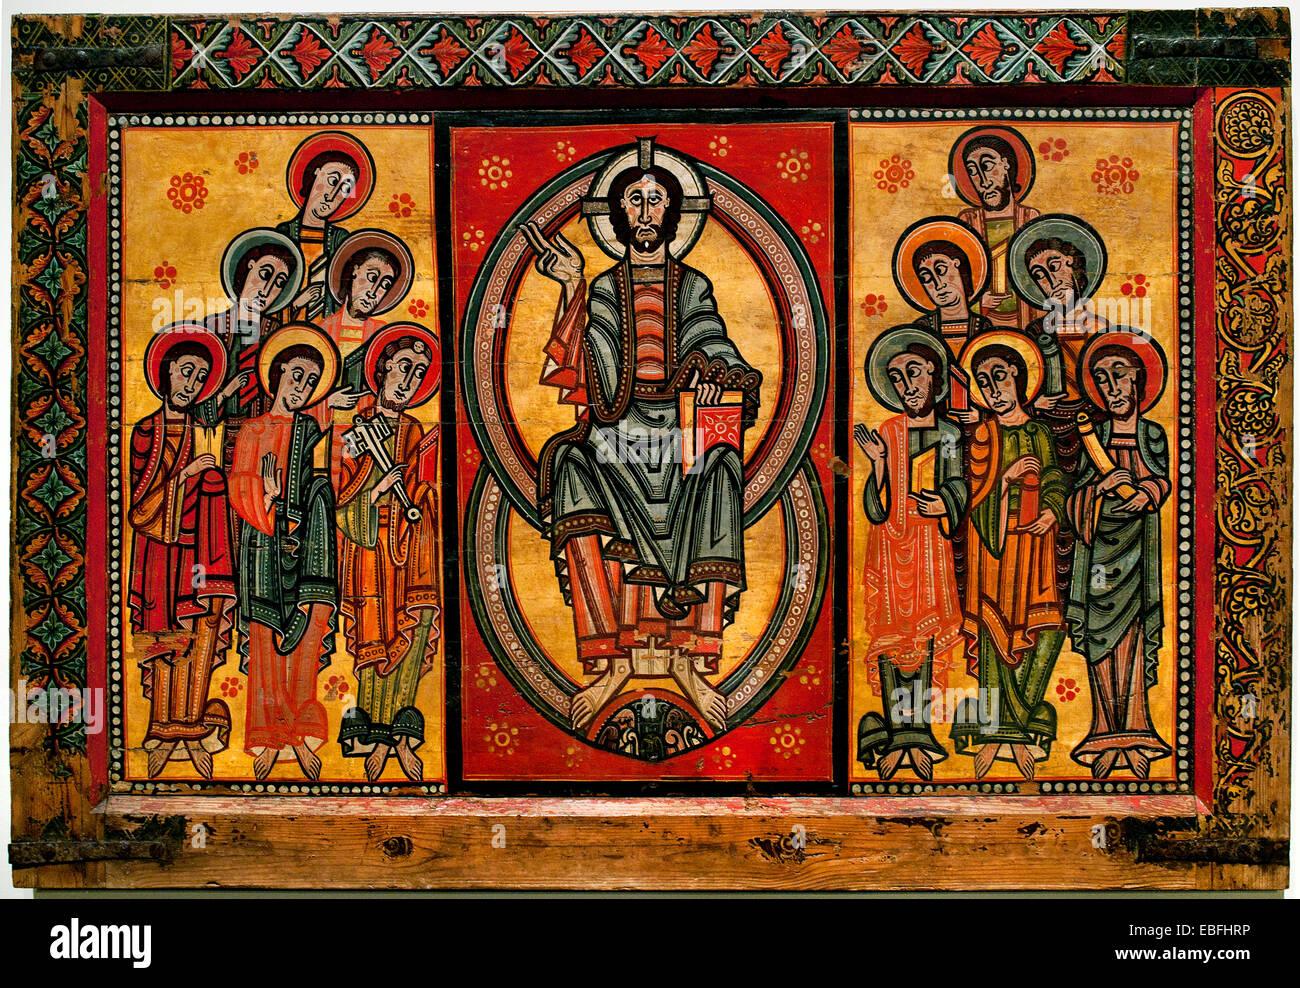 Altar frontal La Seu d'Urgell 'Maiestas Domini' (Christ in Majesty) twelve Apostles Medieval Romanesque - Stock Image